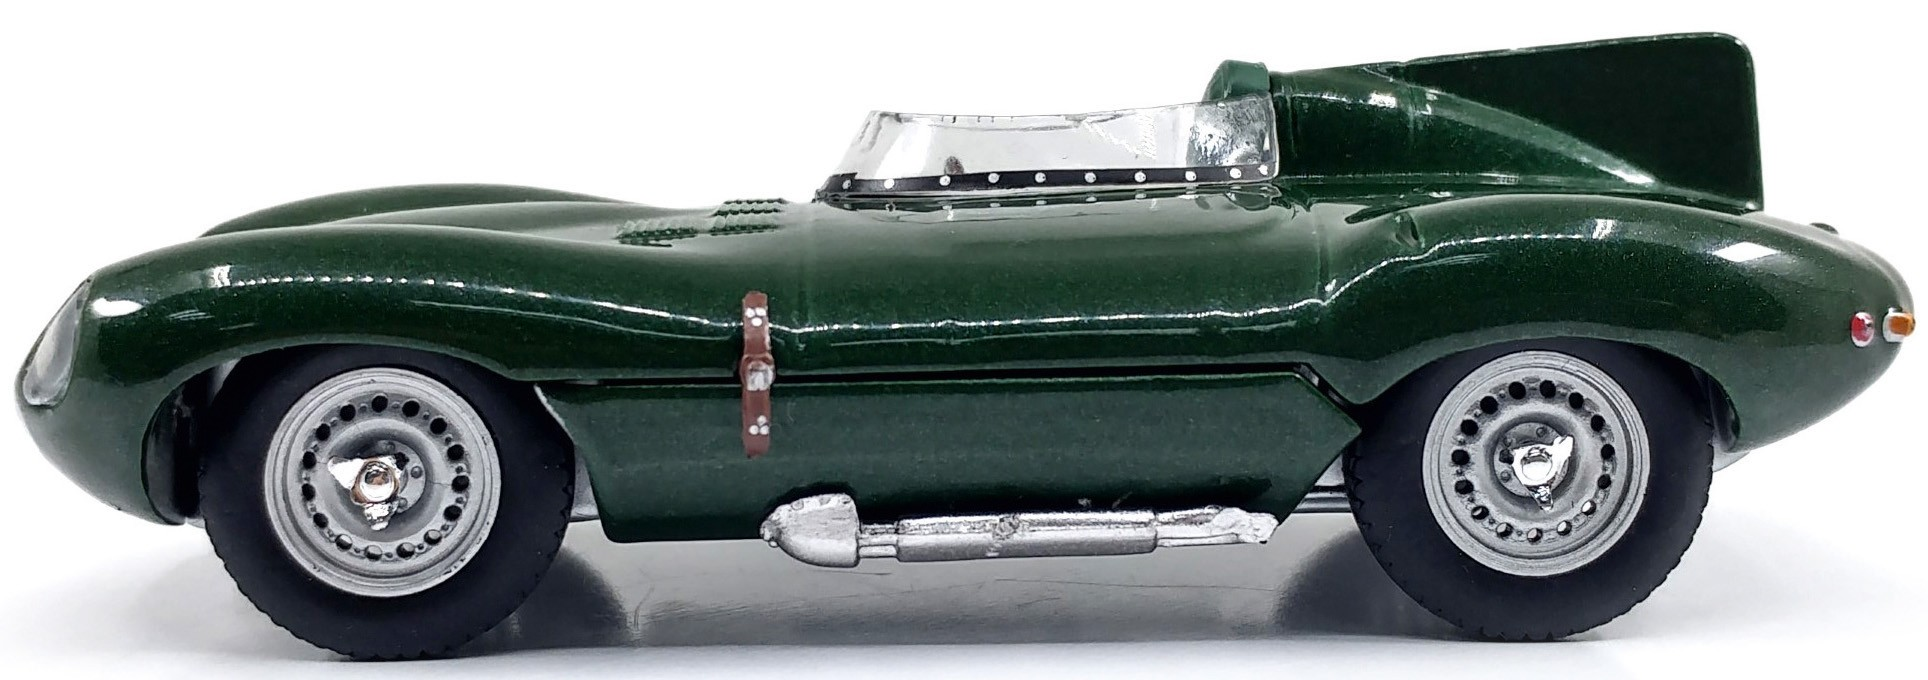 S4303000  Jaguar D 1952, groen, Solido